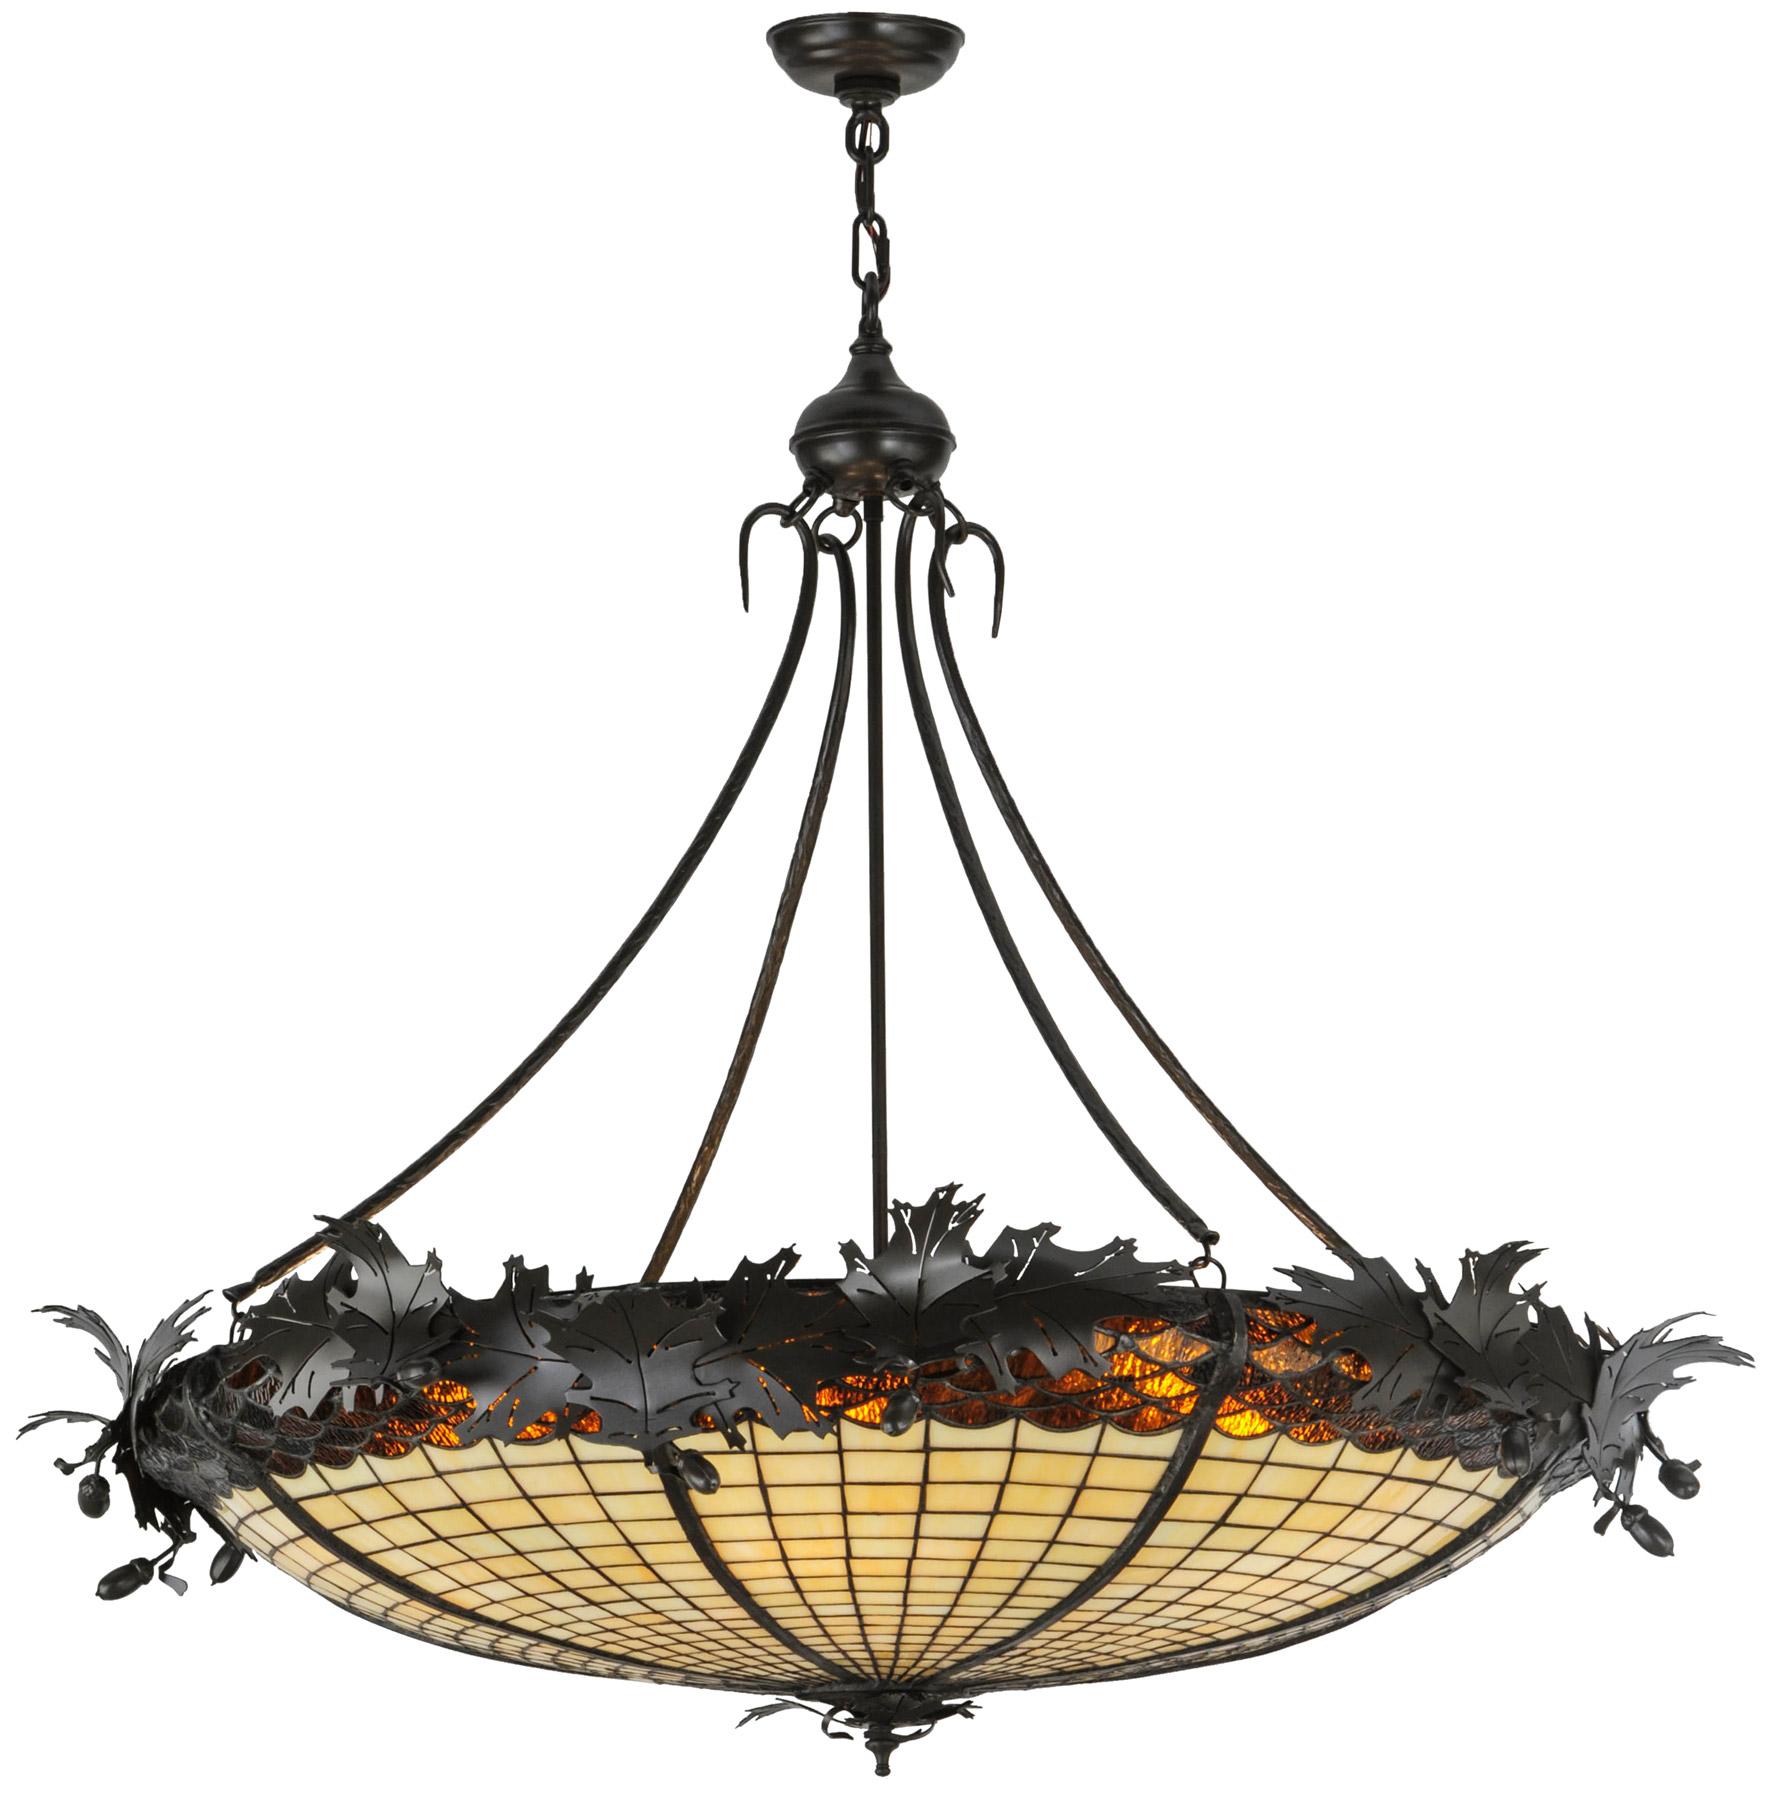 sc 1 st  L&s Beautiful & Meyda 144387 Greenbriar Oak Inverted Pendant